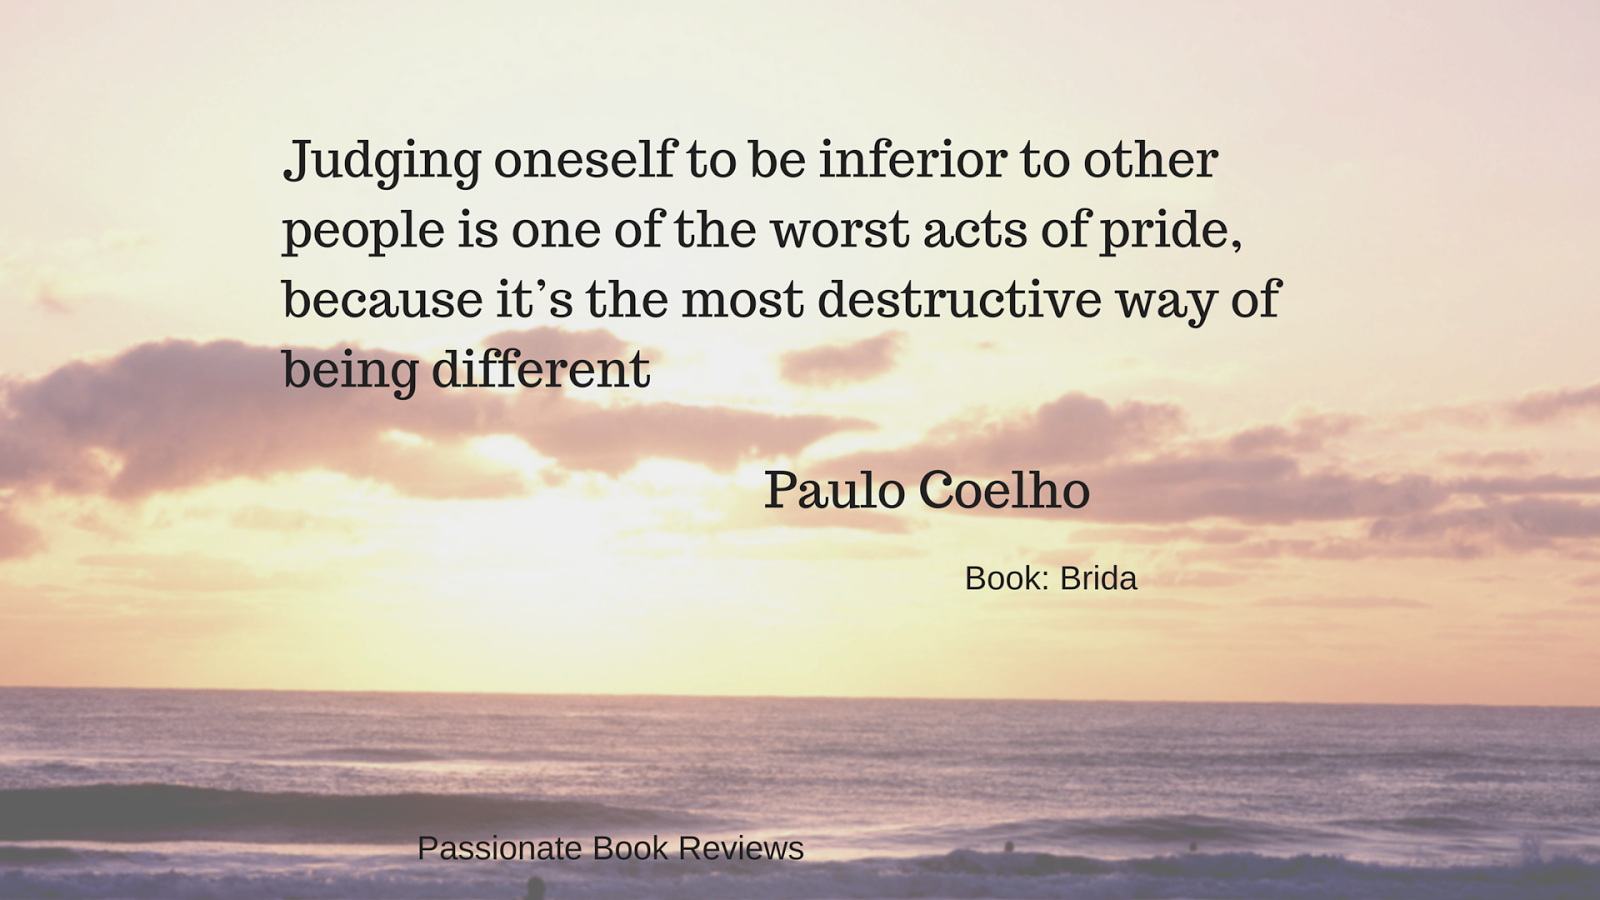 Paulo Coelho Quotes From Books. QuotesGram